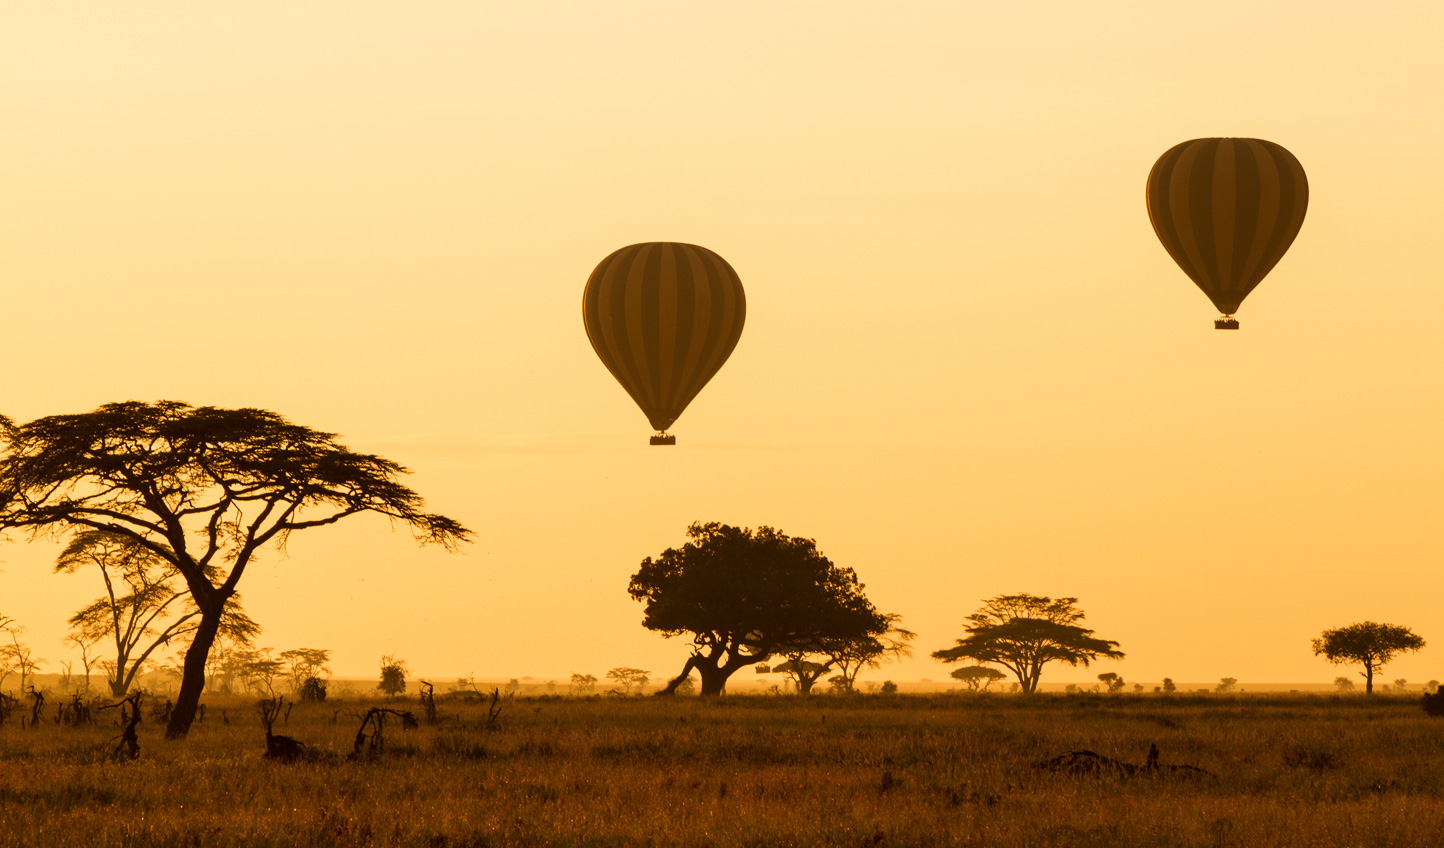 Soar above the Serengeti